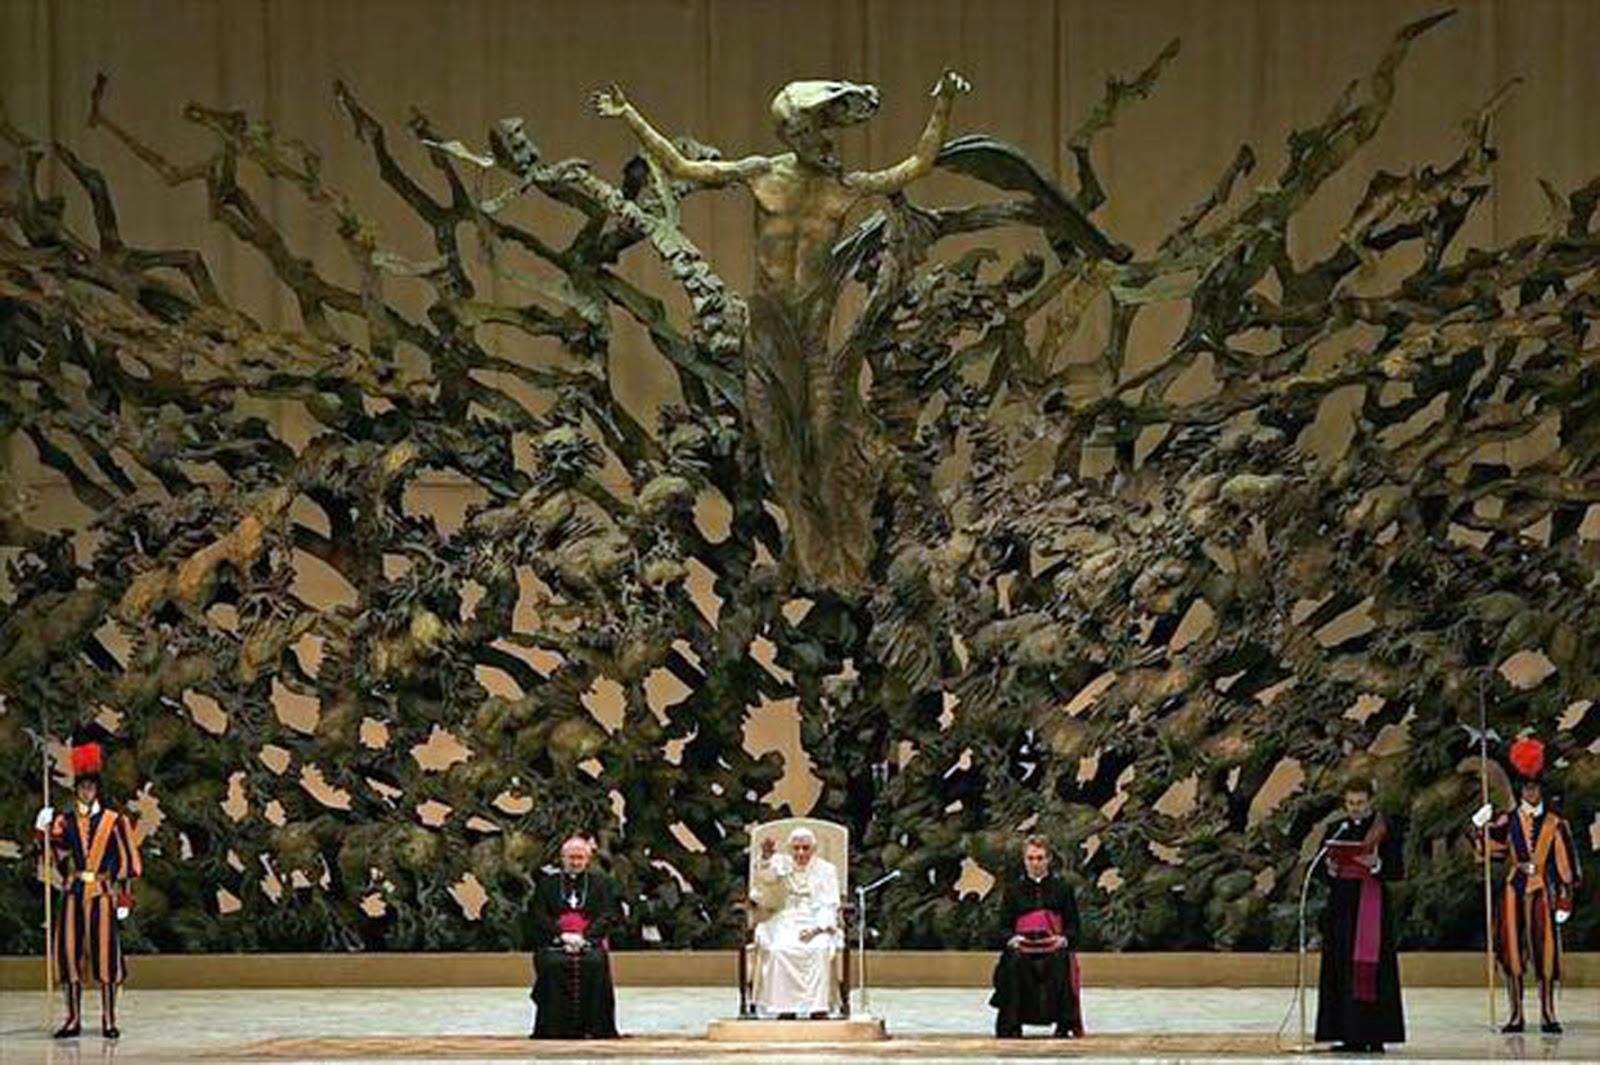 sculpture_vatican1.jpg